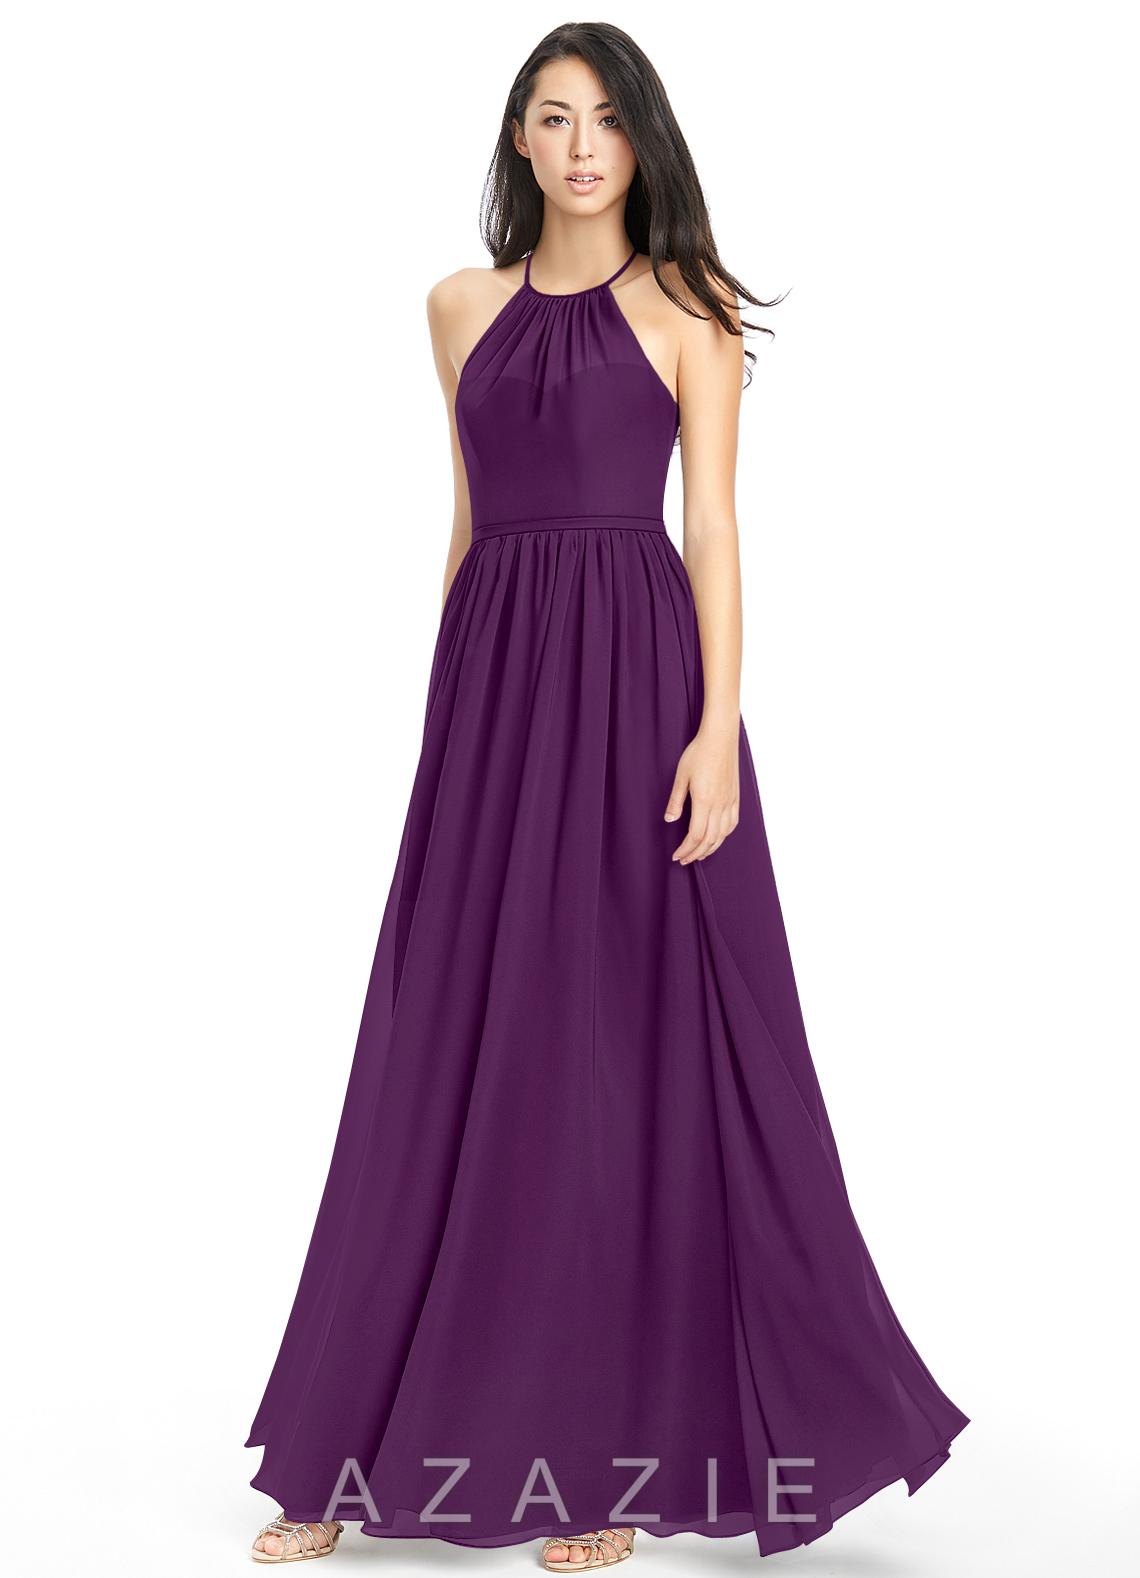 Purple And Black Bridesmaid Dresses Gallery - Braidsmaid Dress ...